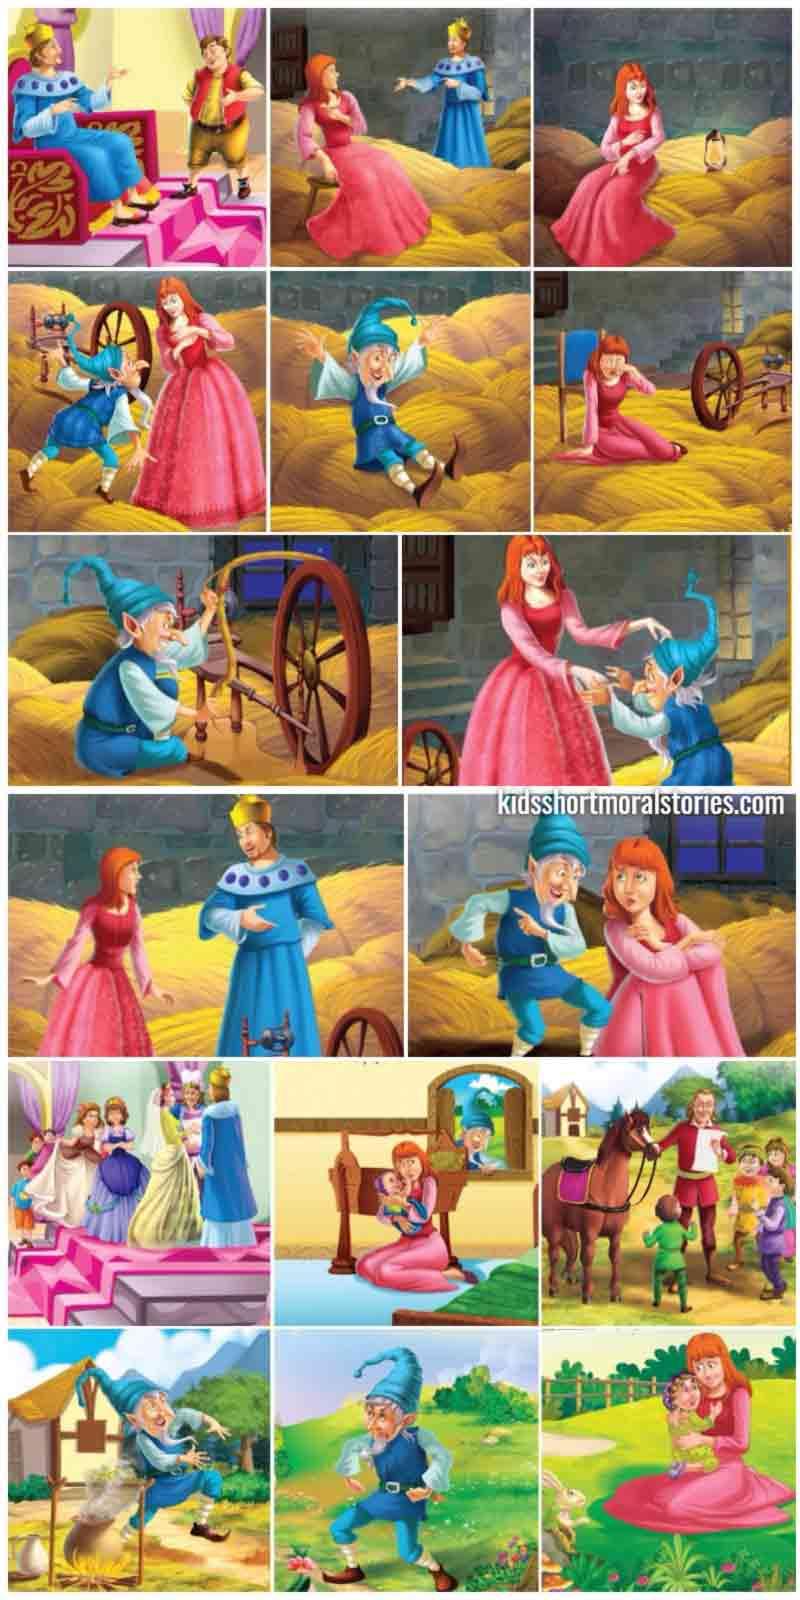 Rumpelstiltskin - Classic Fairy Tales and Stories For Children